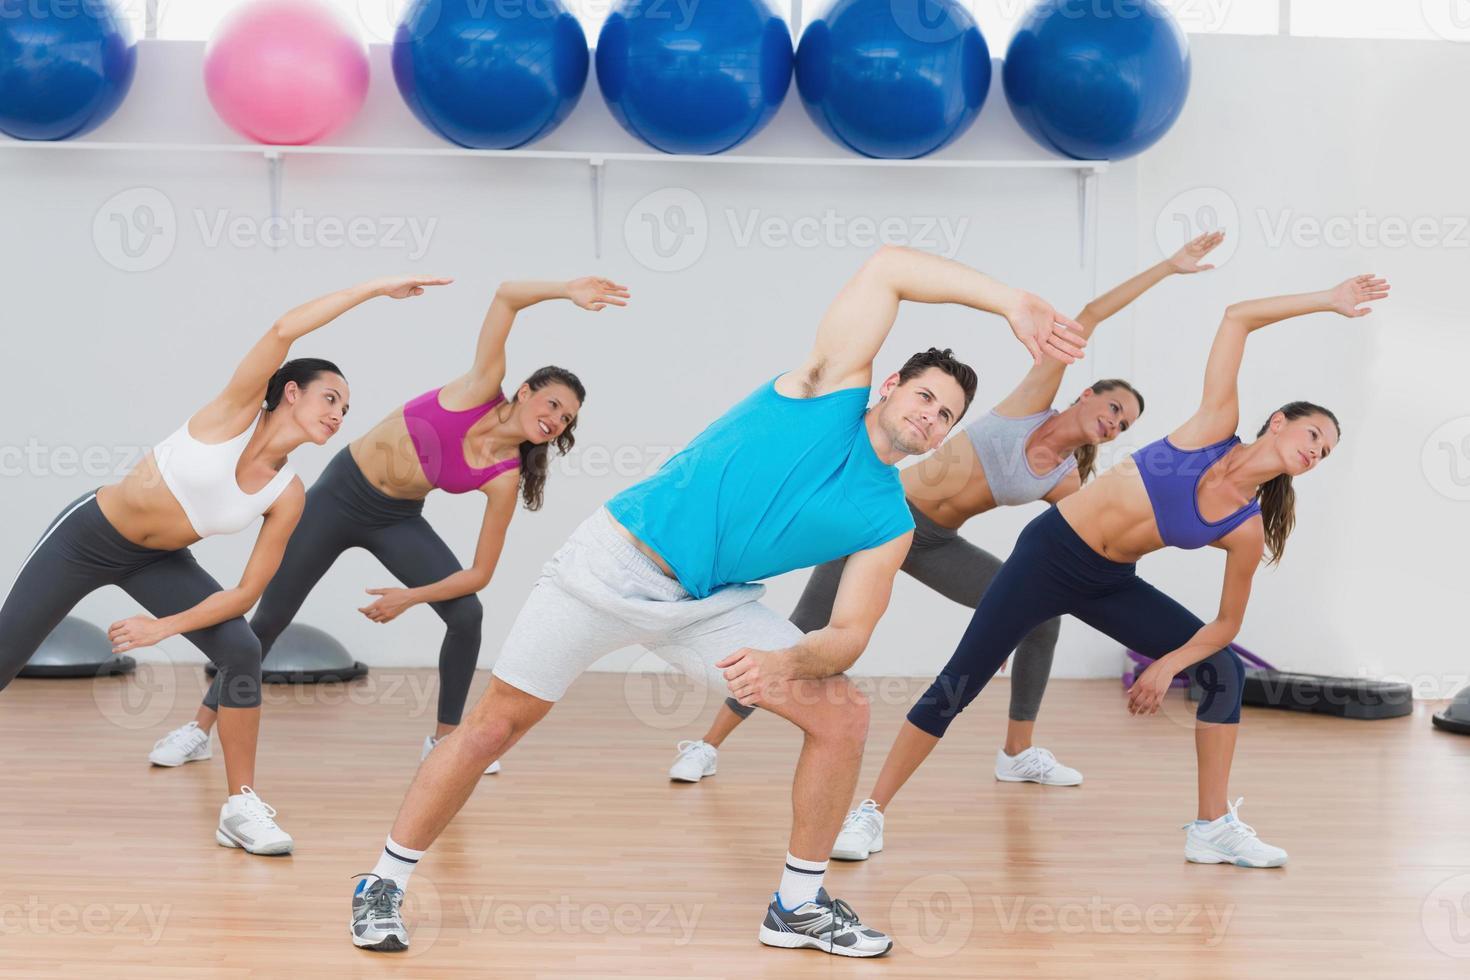 klasse doen rekoefening in fitness-studio foto